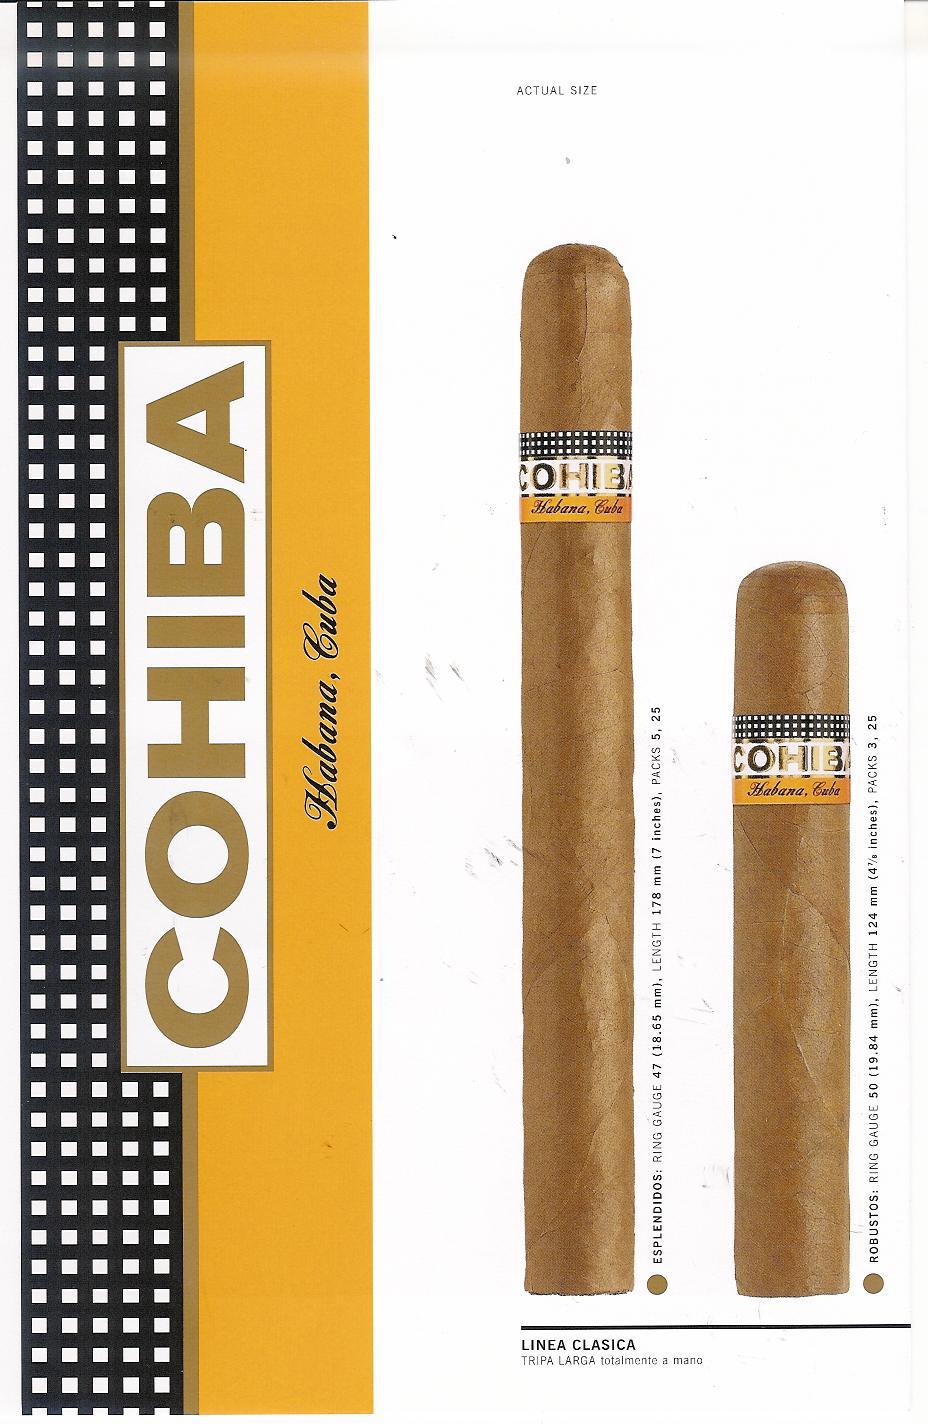 Order Cigars Cohiba Siglo VI | Buy Cigarettes